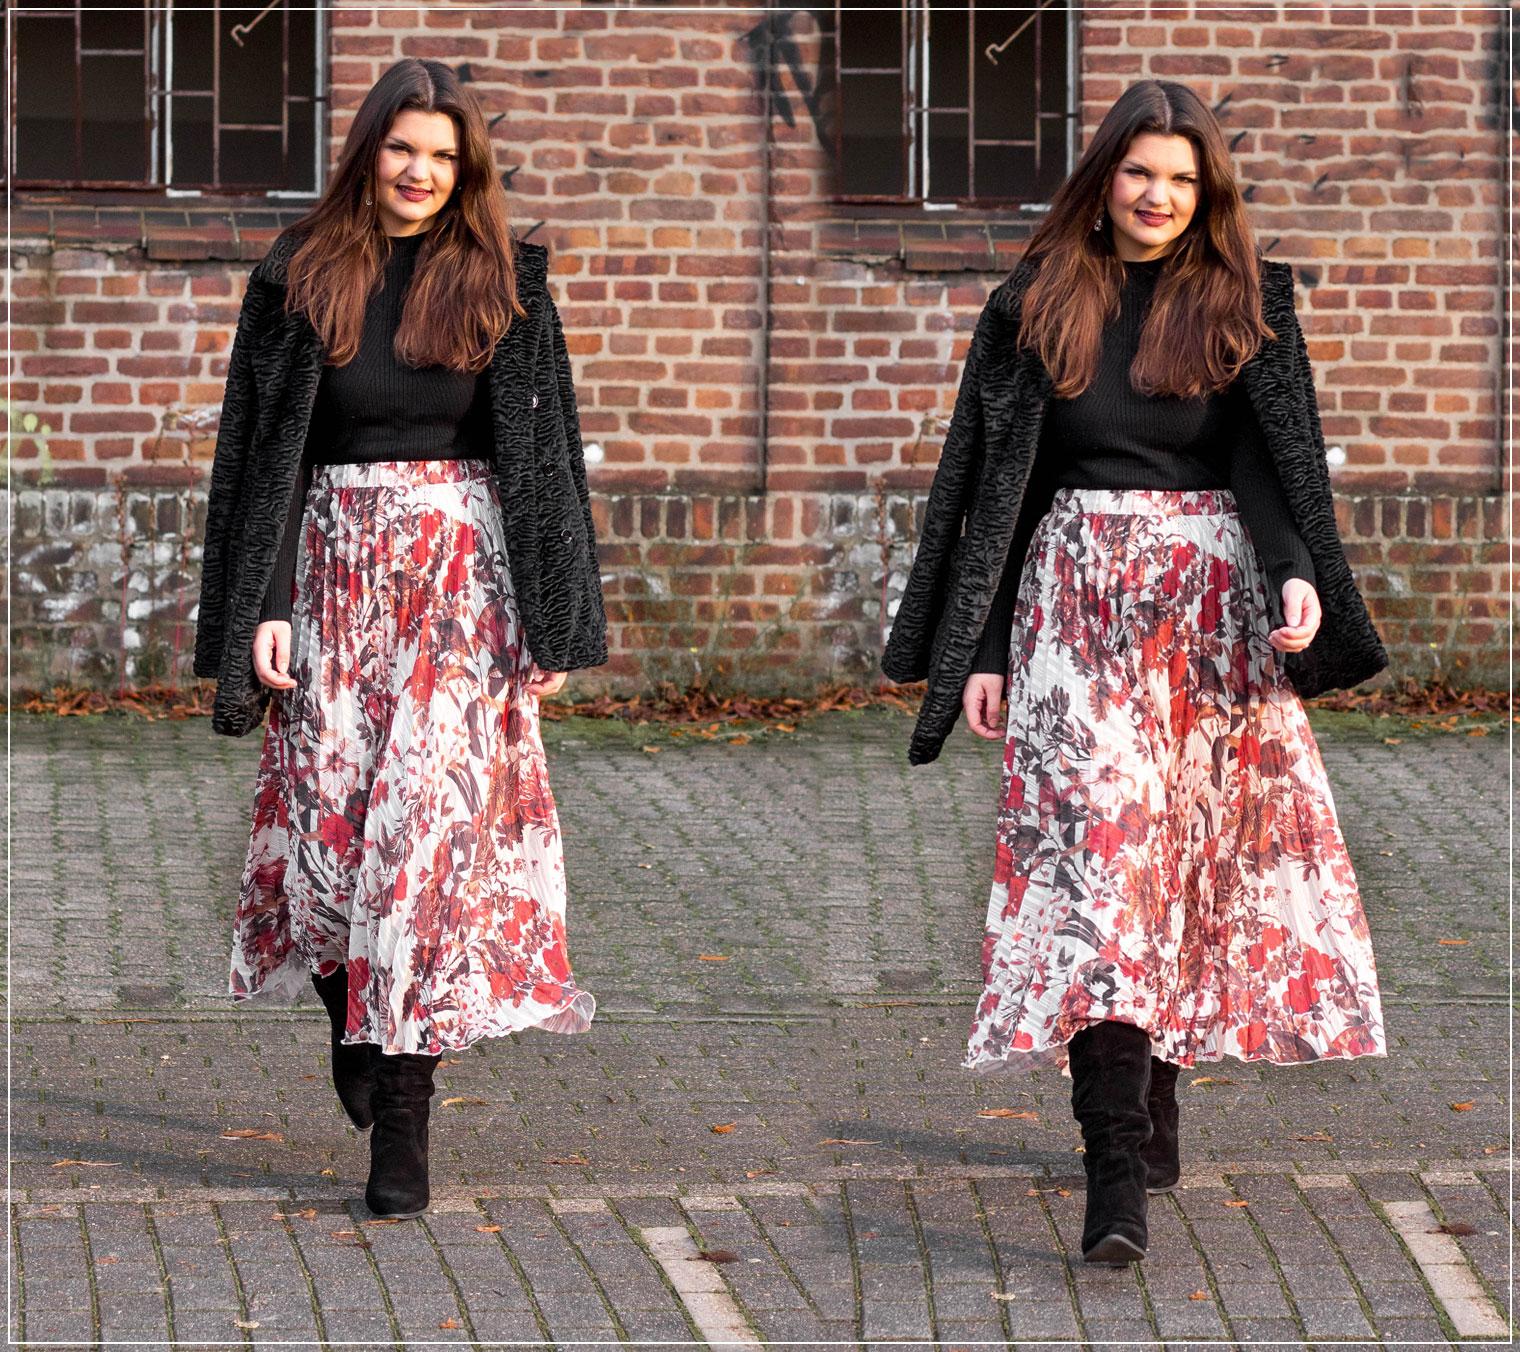 Silvester Outfit, Plissee-Rock, Fake Fur Jacke, Glamour Outfit, Partylook, Silvester-Look, Outfitinspiration, Modebloggerin, Fashionbloggerin, Modeblog, Ruhrgebiet